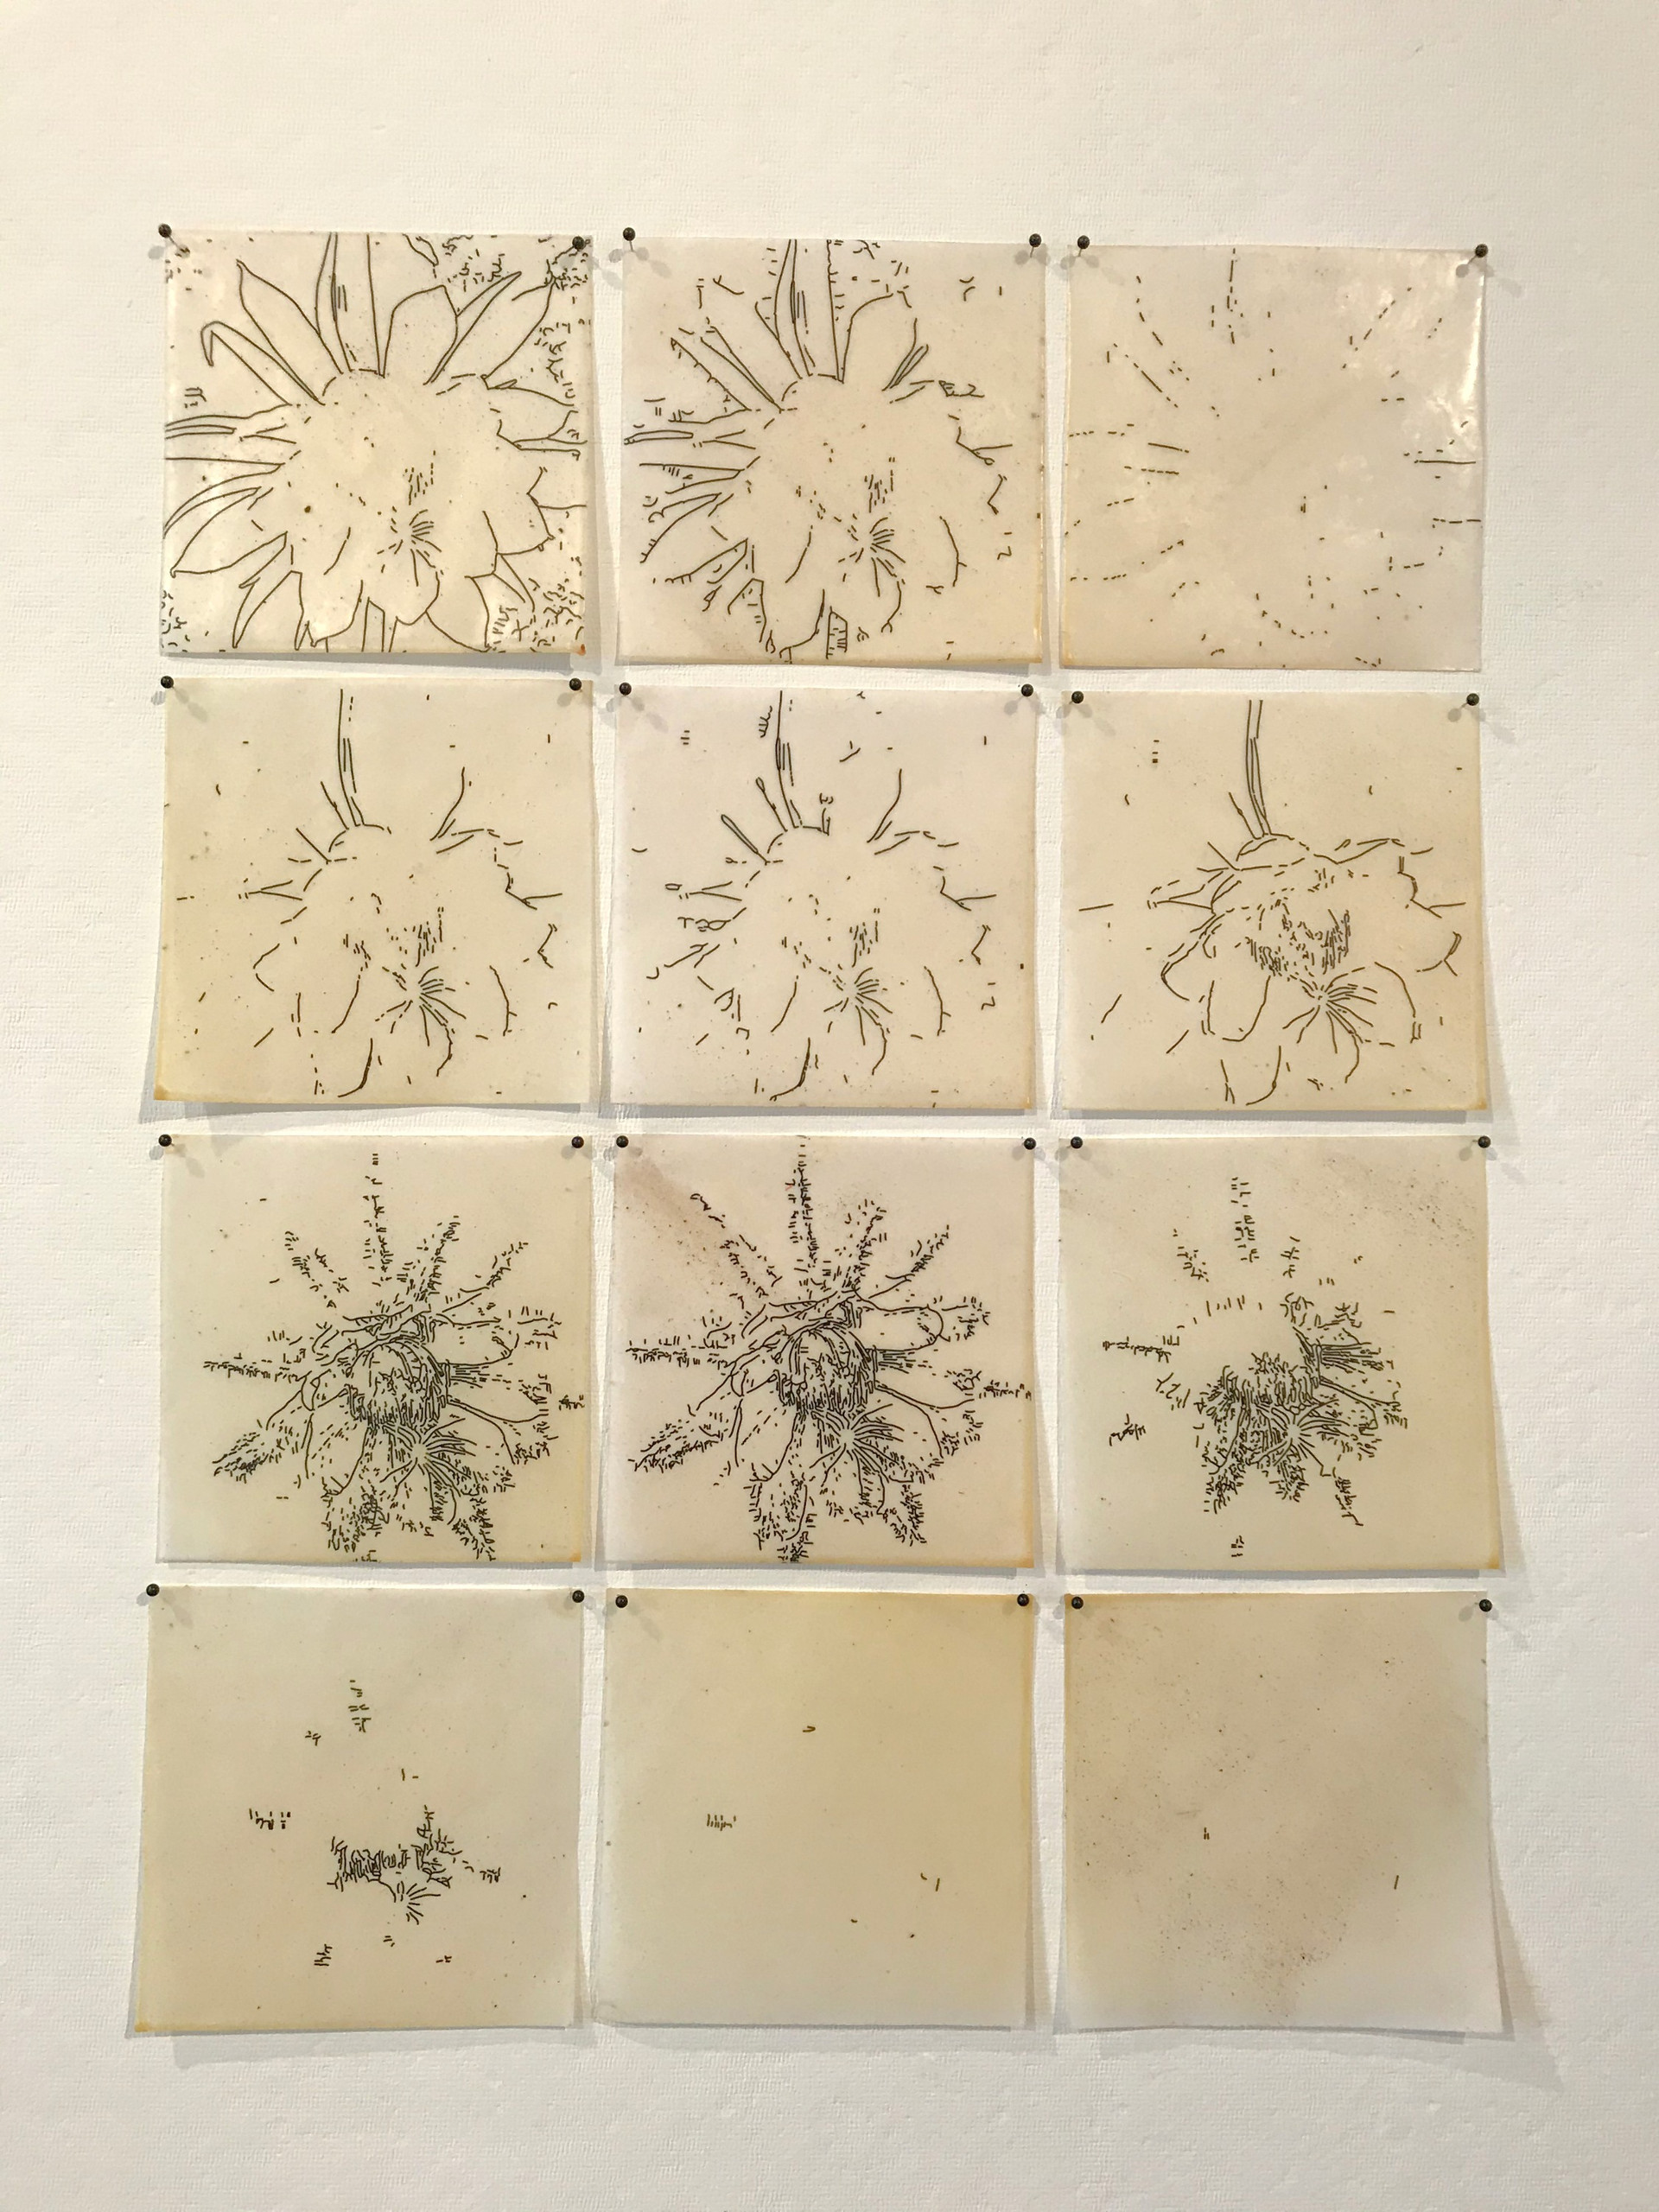 Threshold Drawings: Night Blooming Cereus